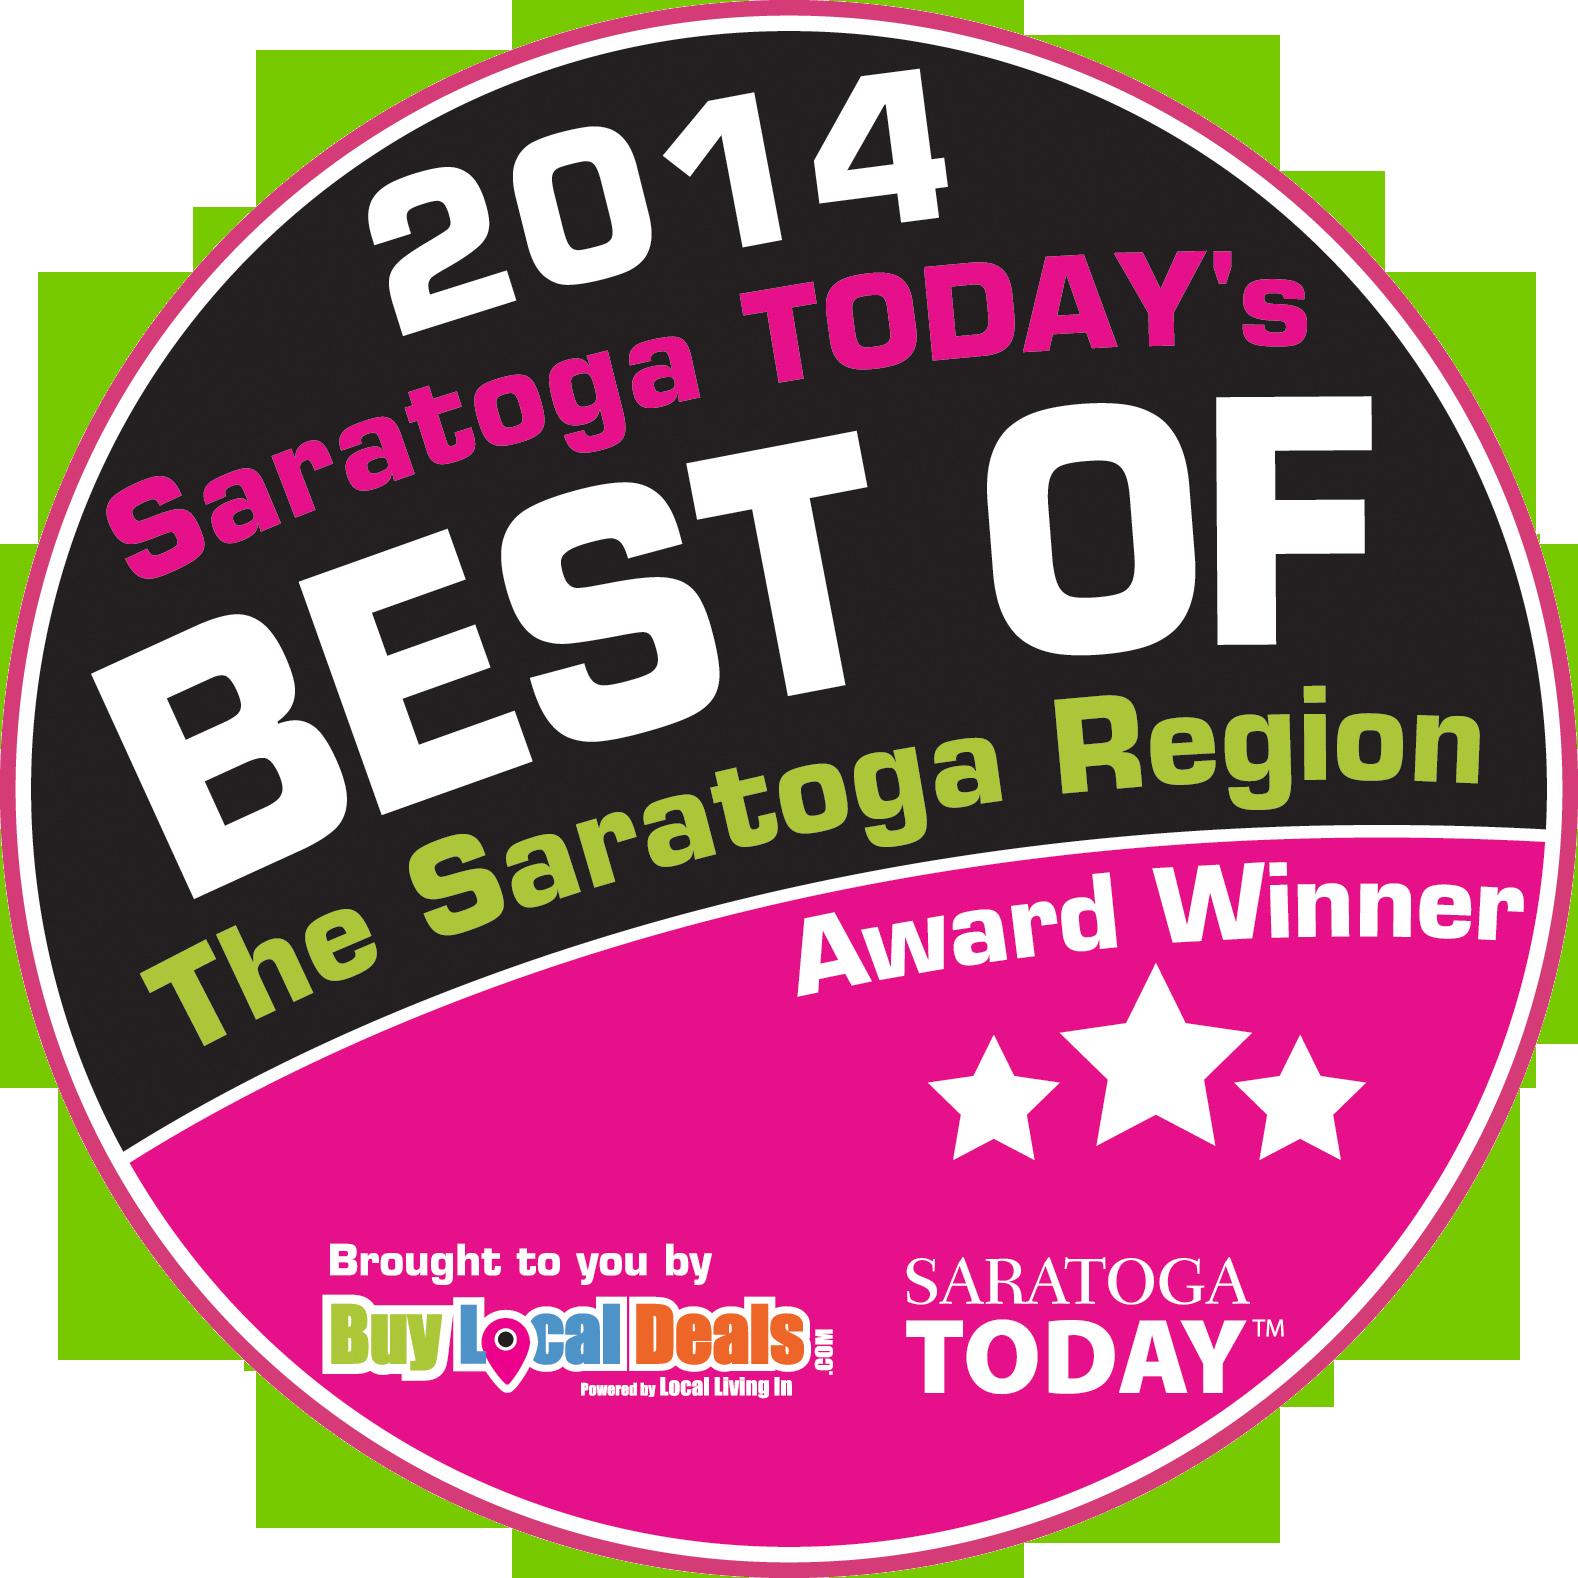 saratoga today best of 2014